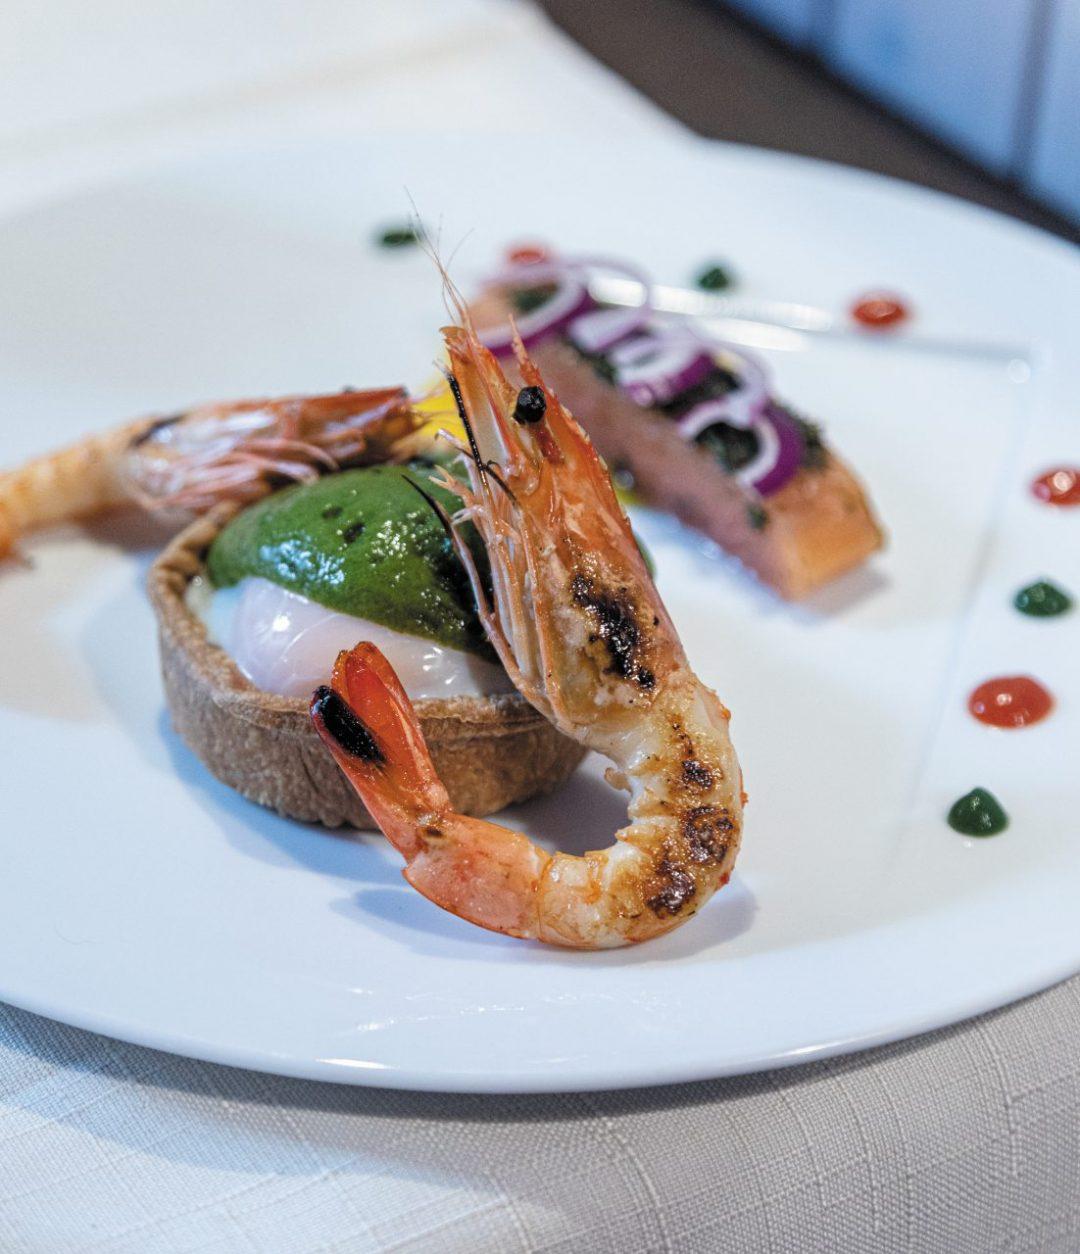 Dove mangiare all'Île-d'Yeu